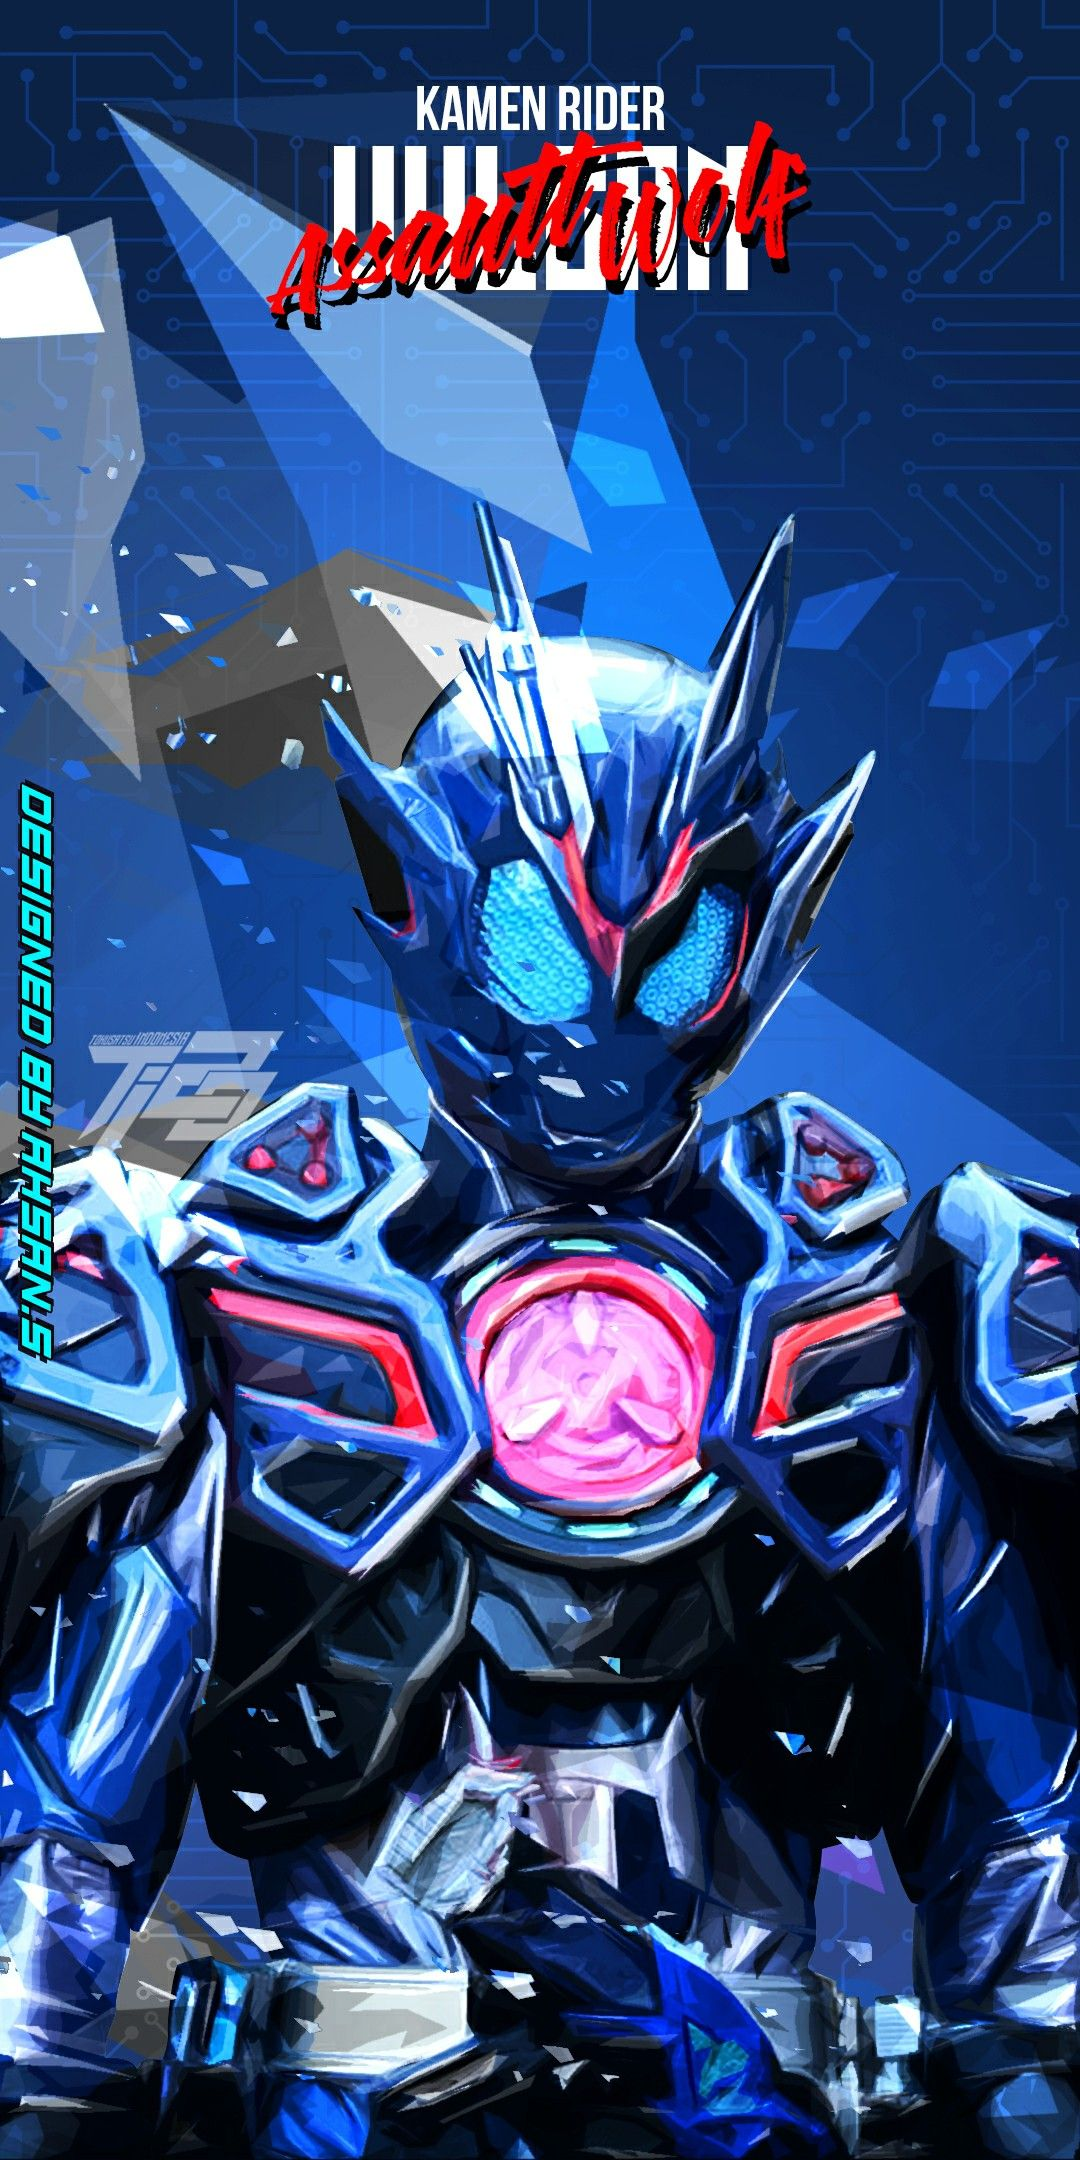 Kamen Rider Vulcan Assault Wolf Gambar Anime Seni Animasi